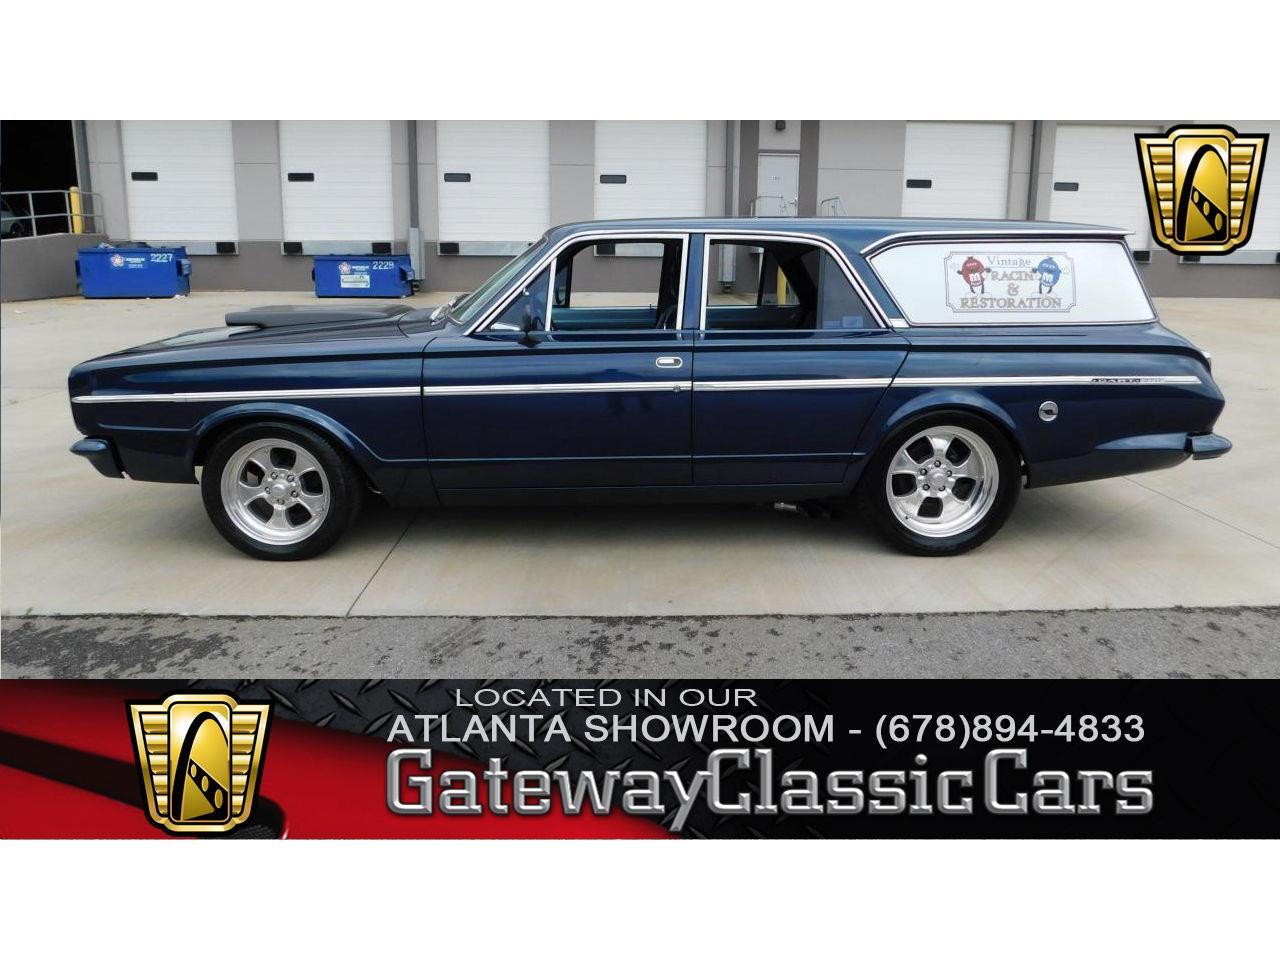 For Sale: 1966 Dodge Dart in Alpharetta, Georgia